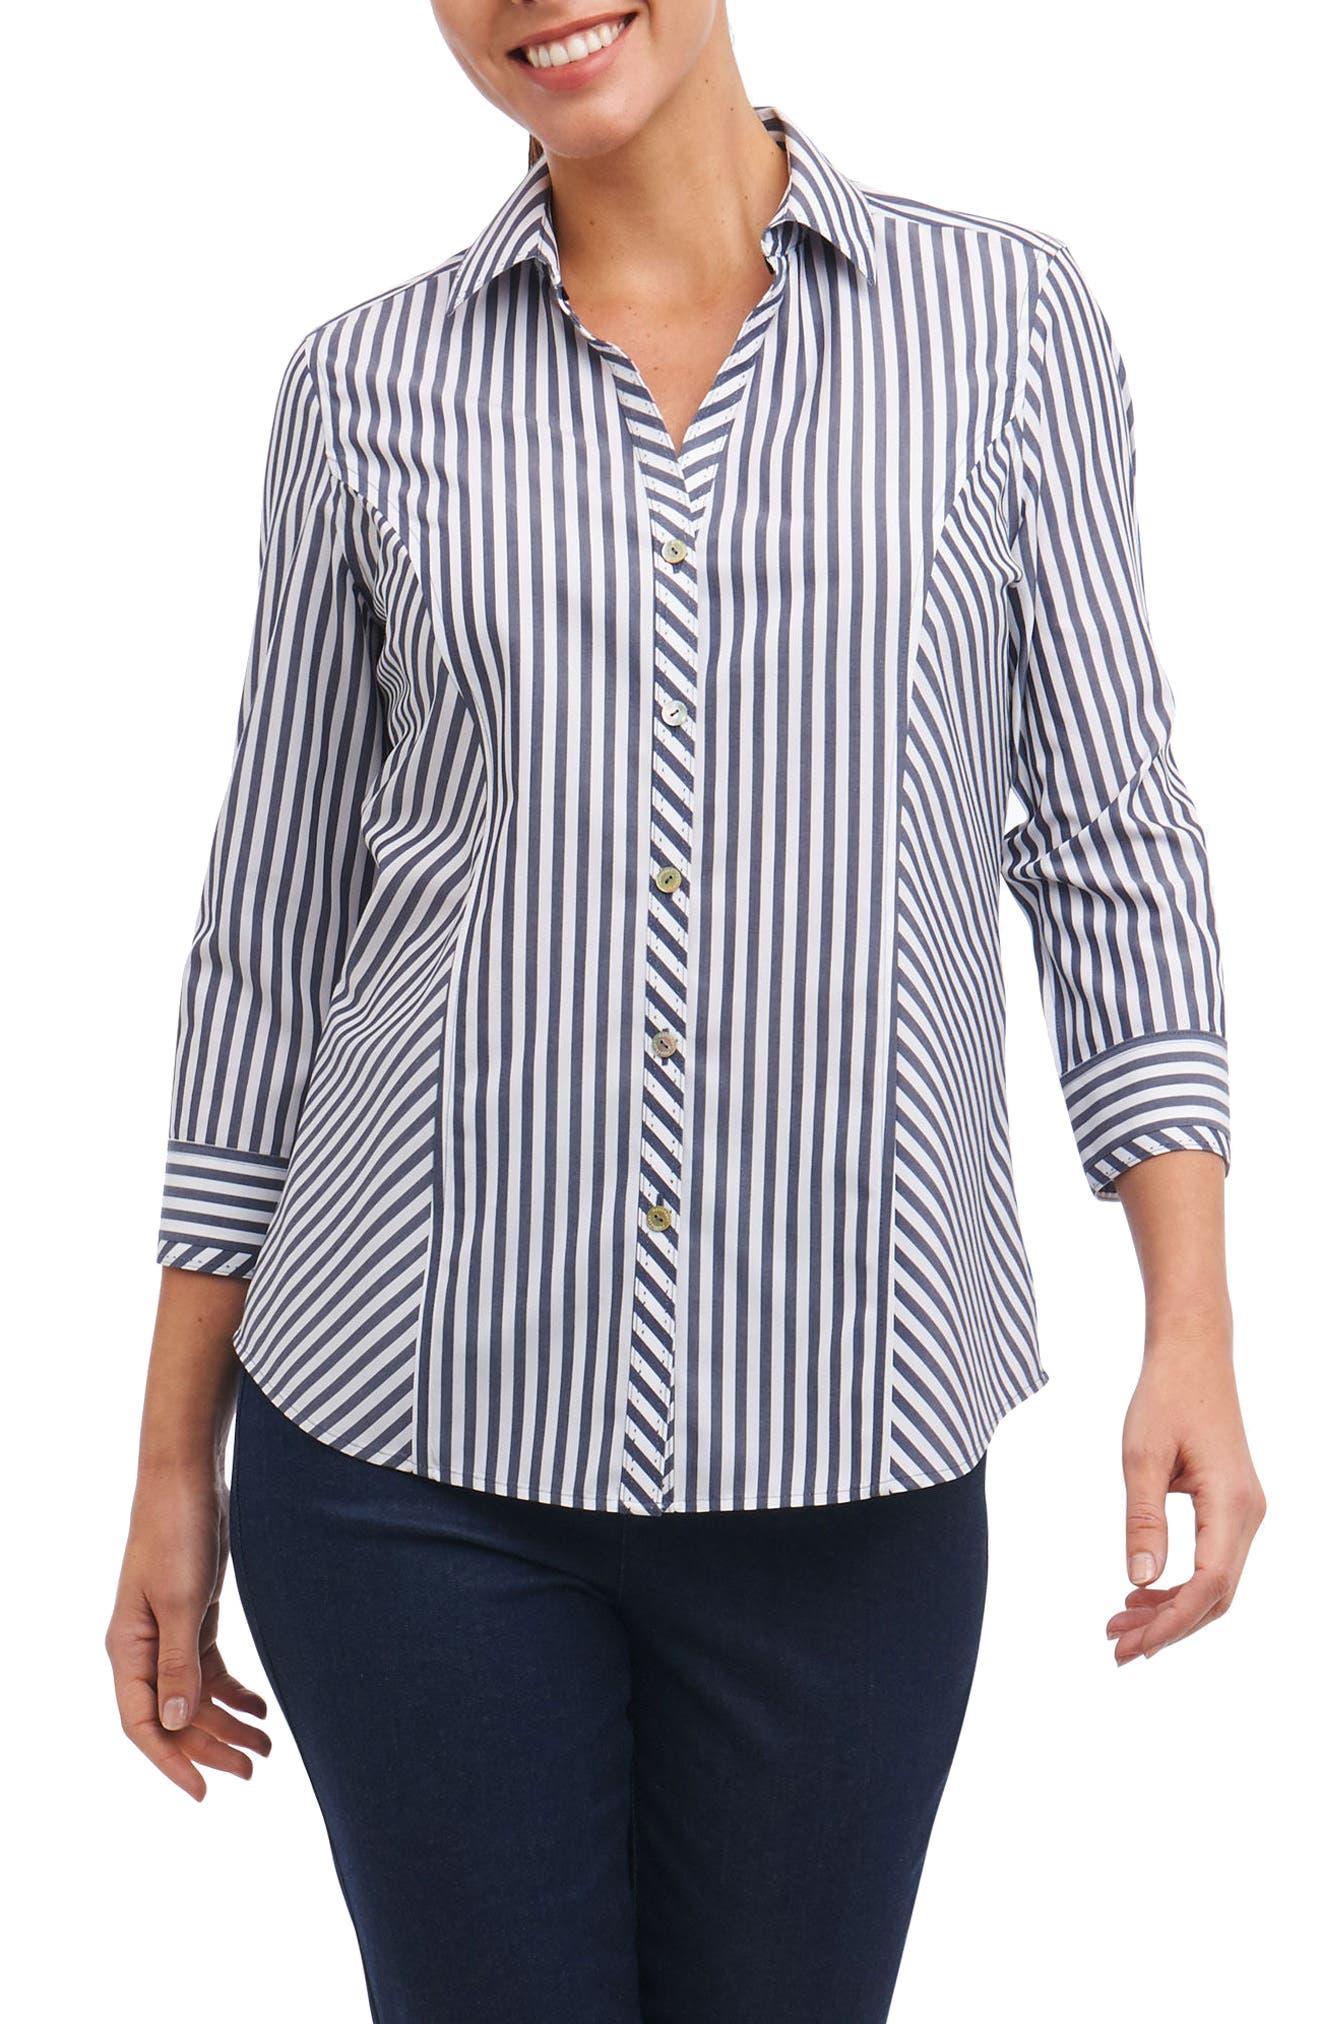 Hope Preppy Stripe Cotton Shirt,                             Main thumbnail 1, color,                             Navy